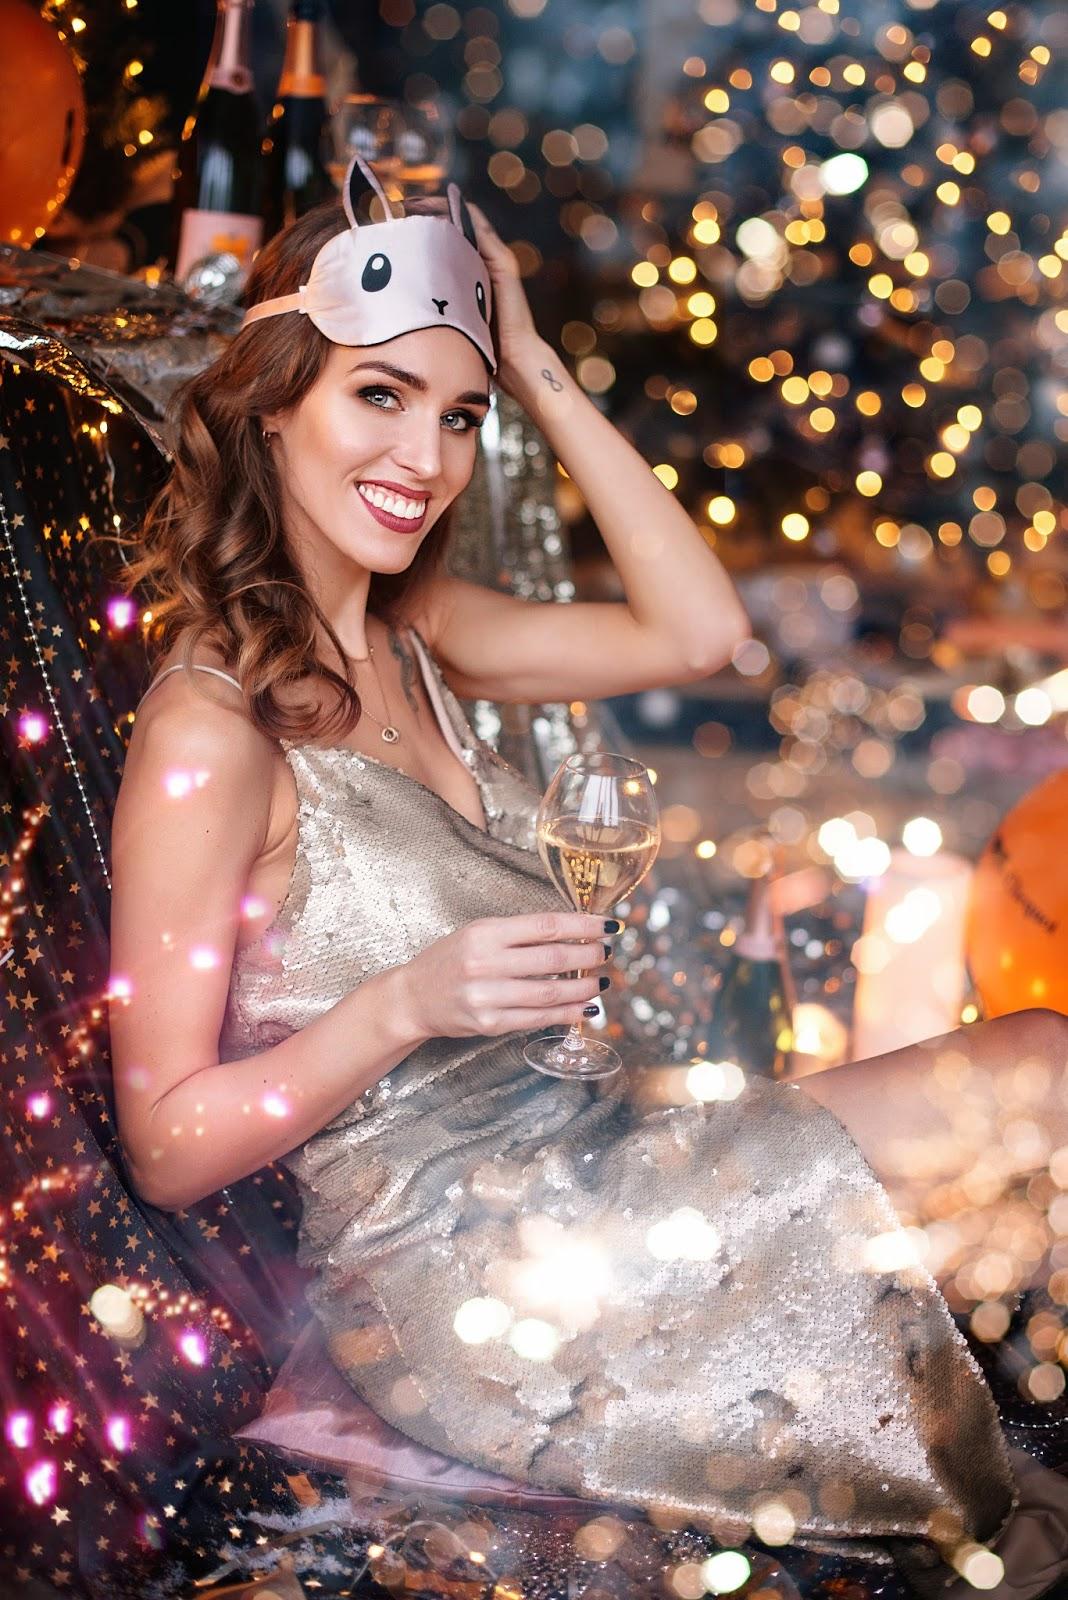 veuve clicquot champagne celebration photography